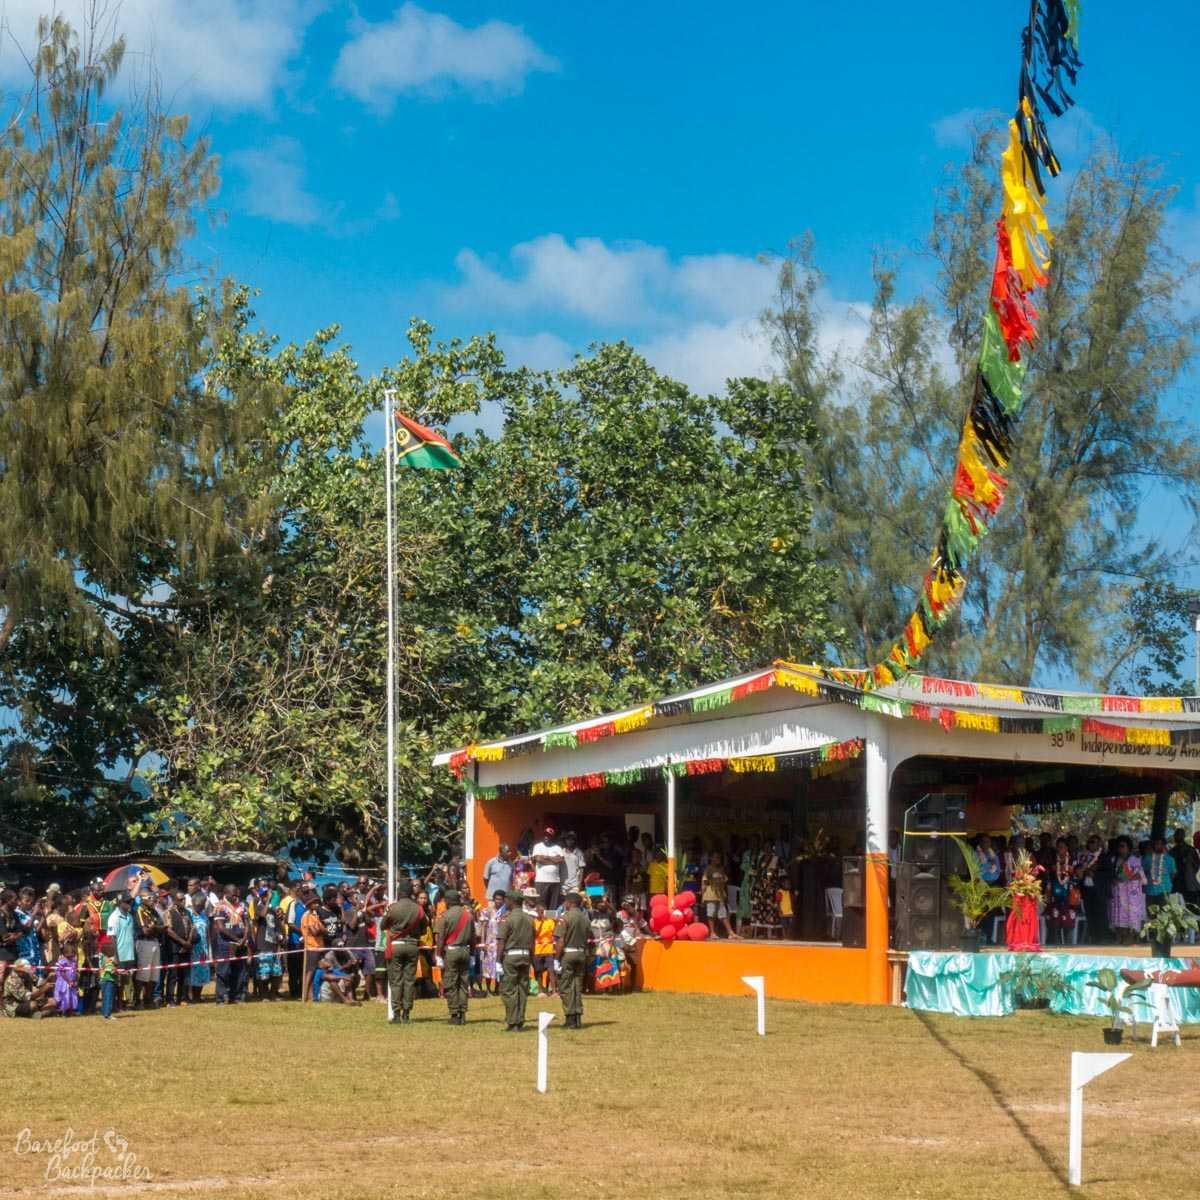 Flag-raising ceremony, Independence Day parade, Unity Park, Luganville, Vanuatu.